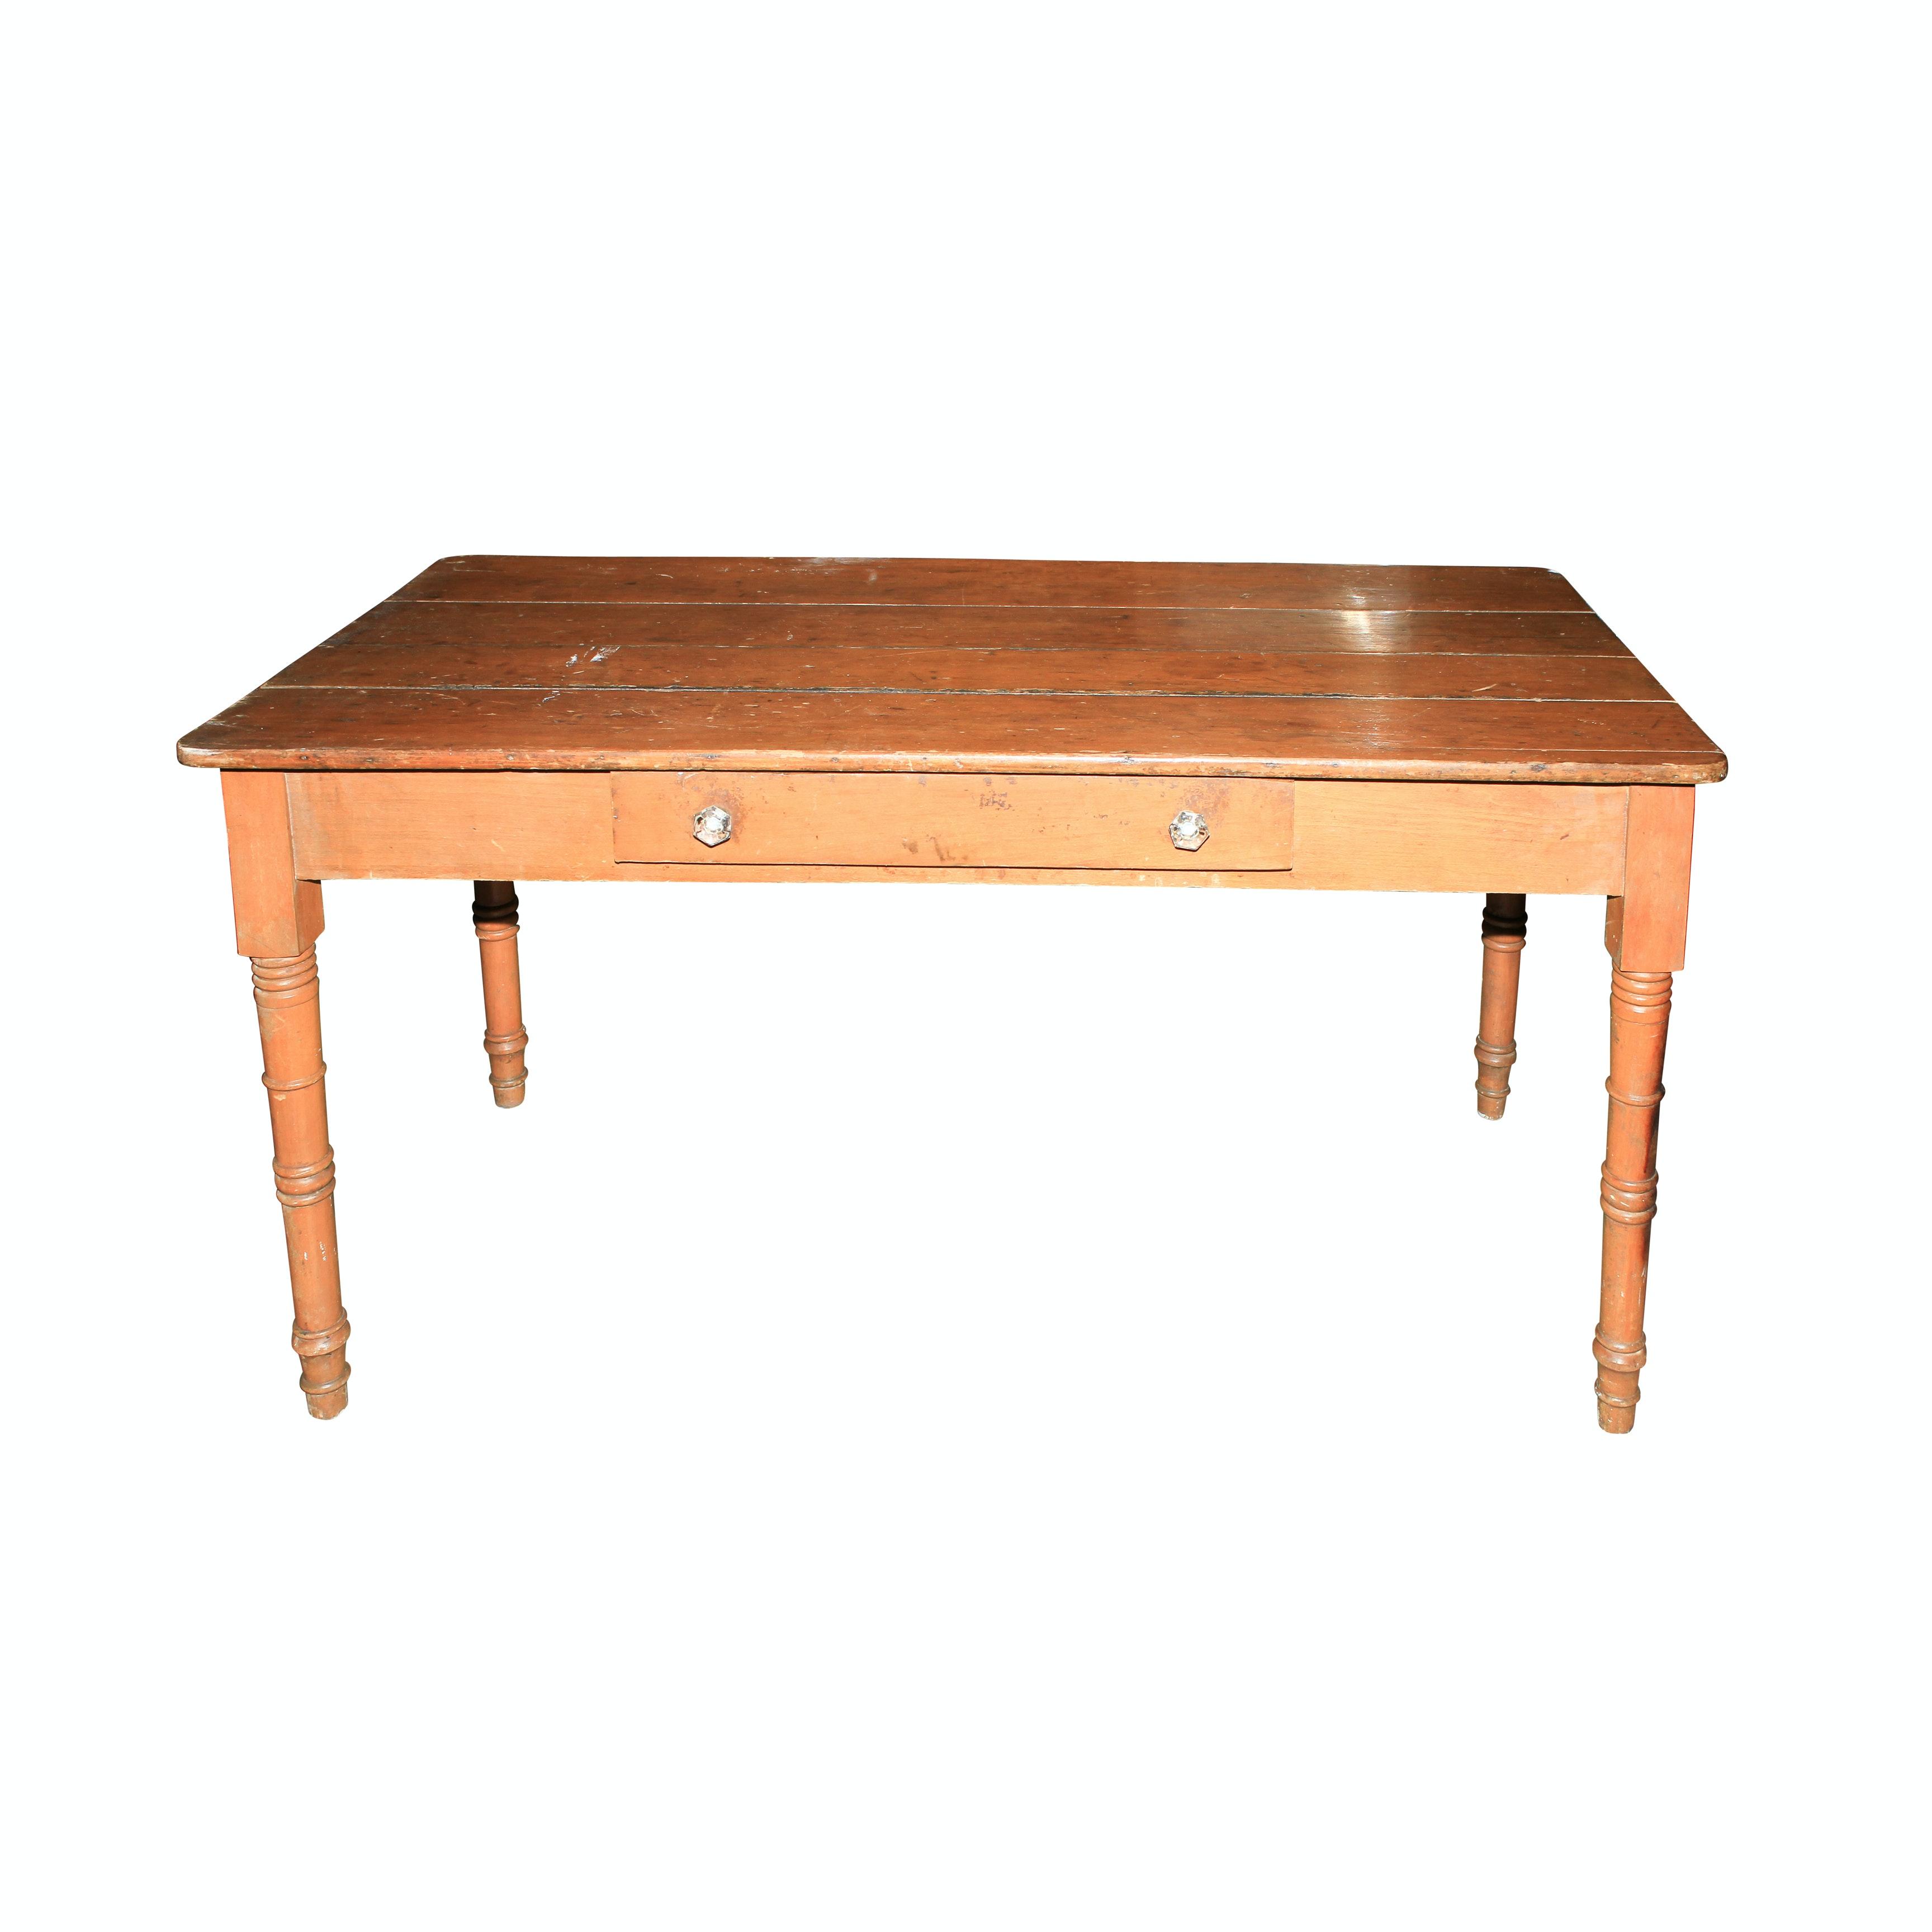 Farmhouse Style Wooden Table